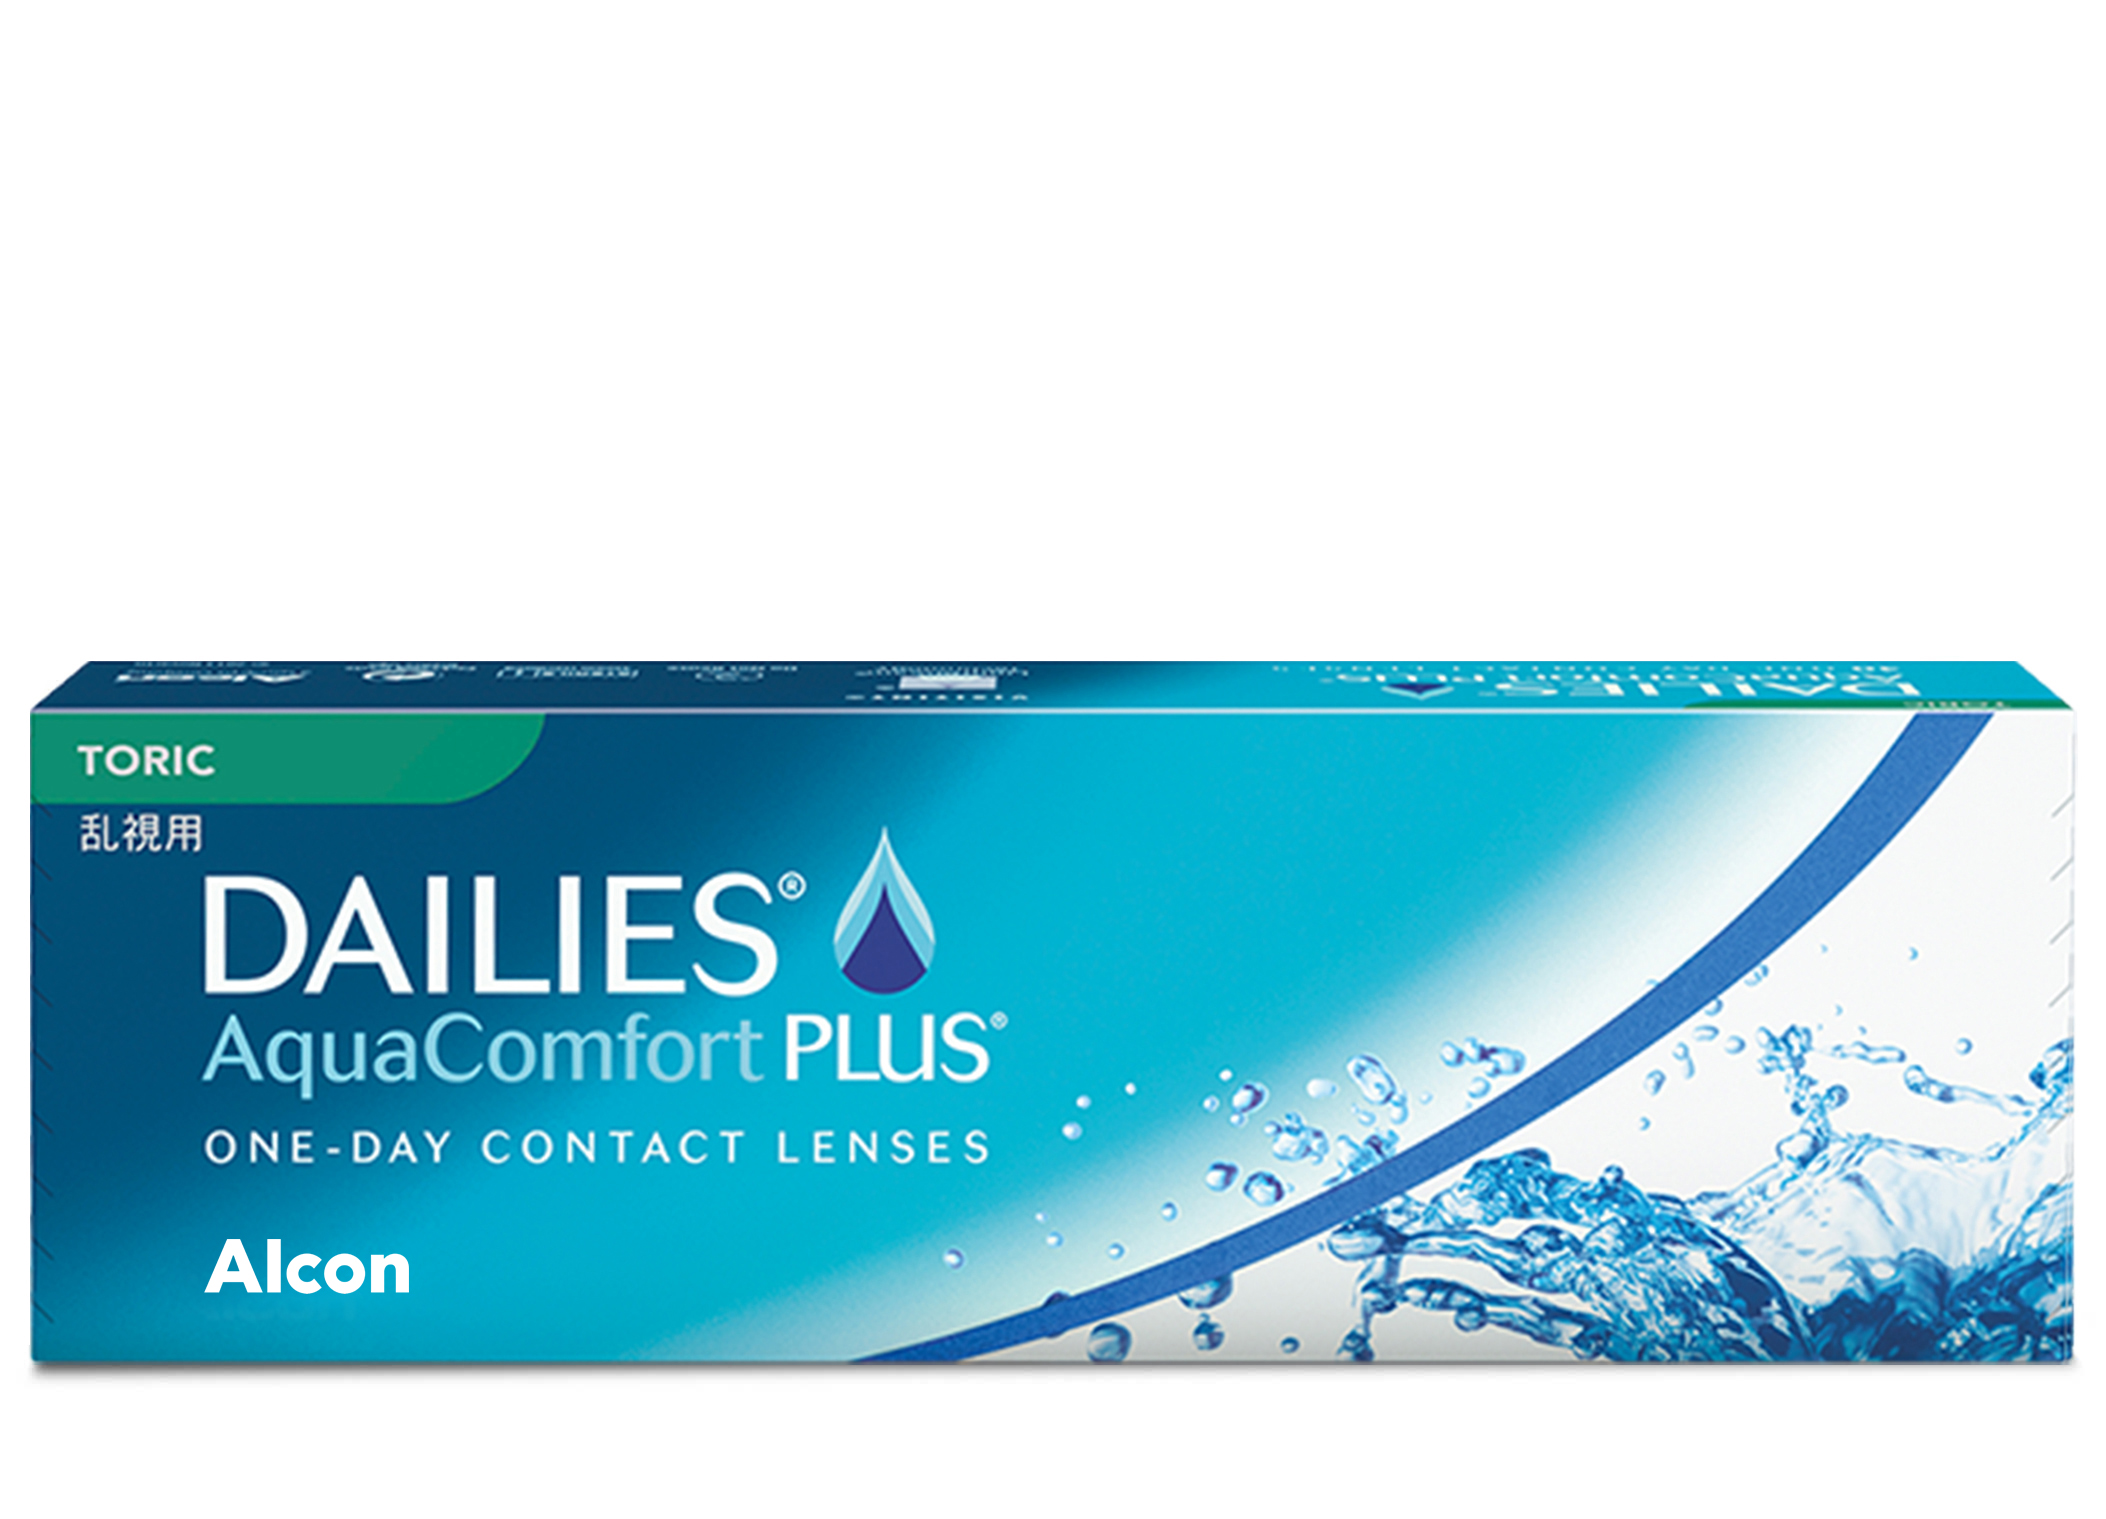 dailies comforter online htm multifocal pack aqua p buy total comfort